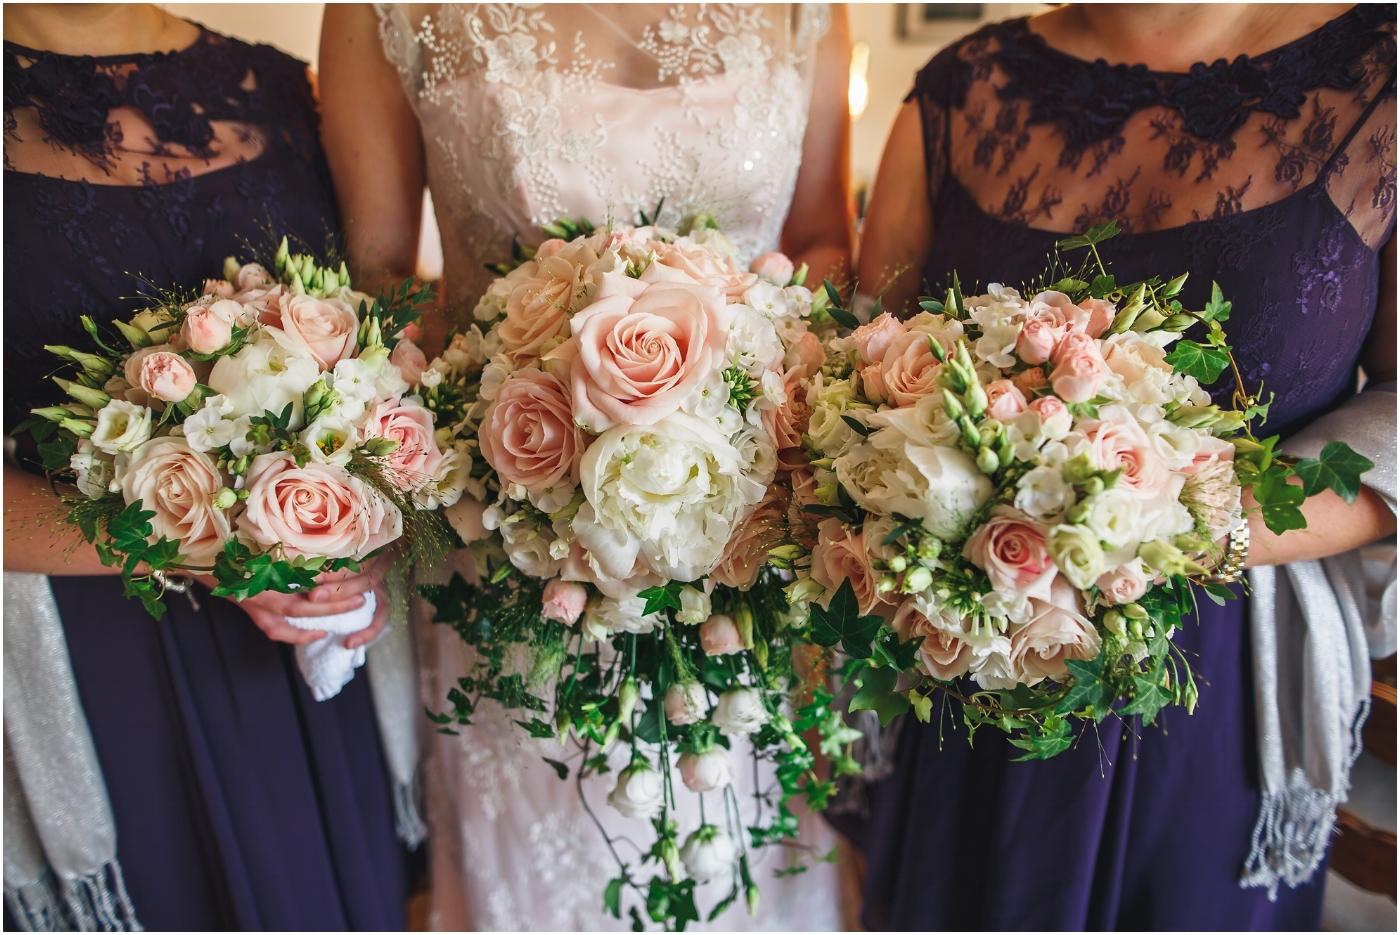 Bridal flowers by tineke at west mills darley abbey